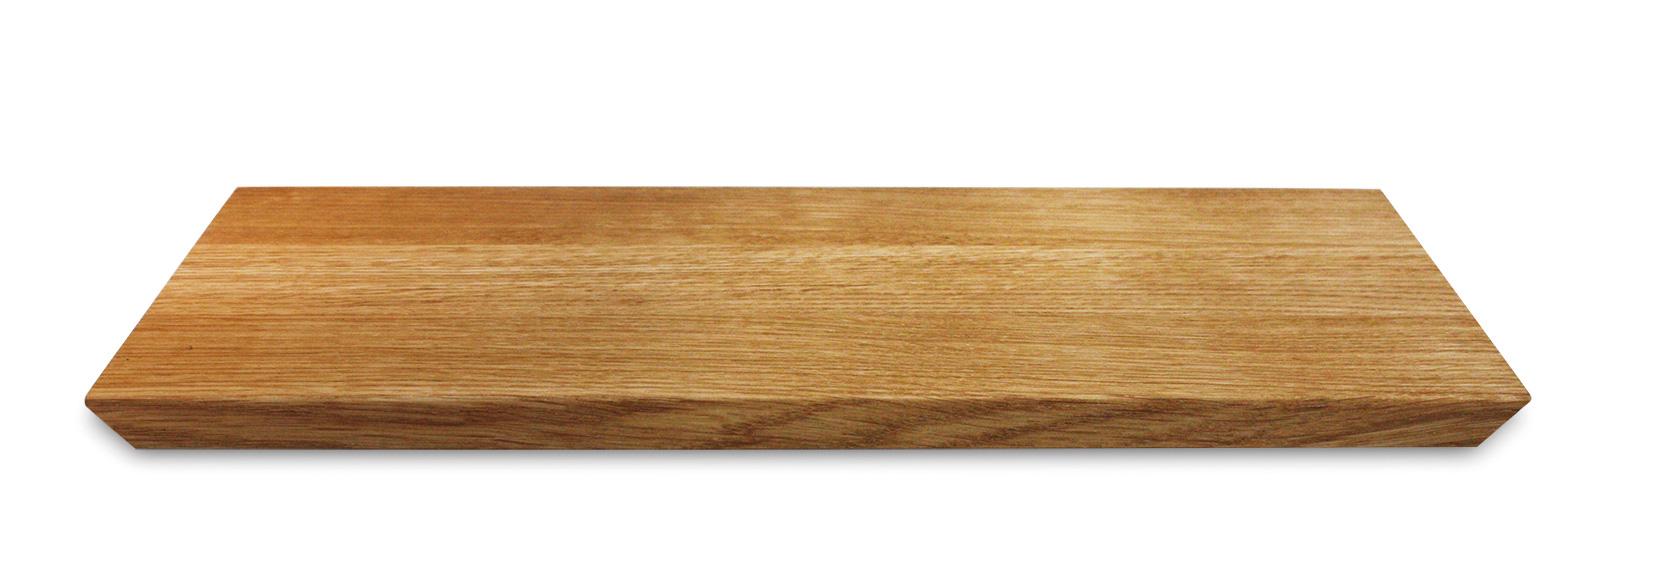 Eiche Holz Brett